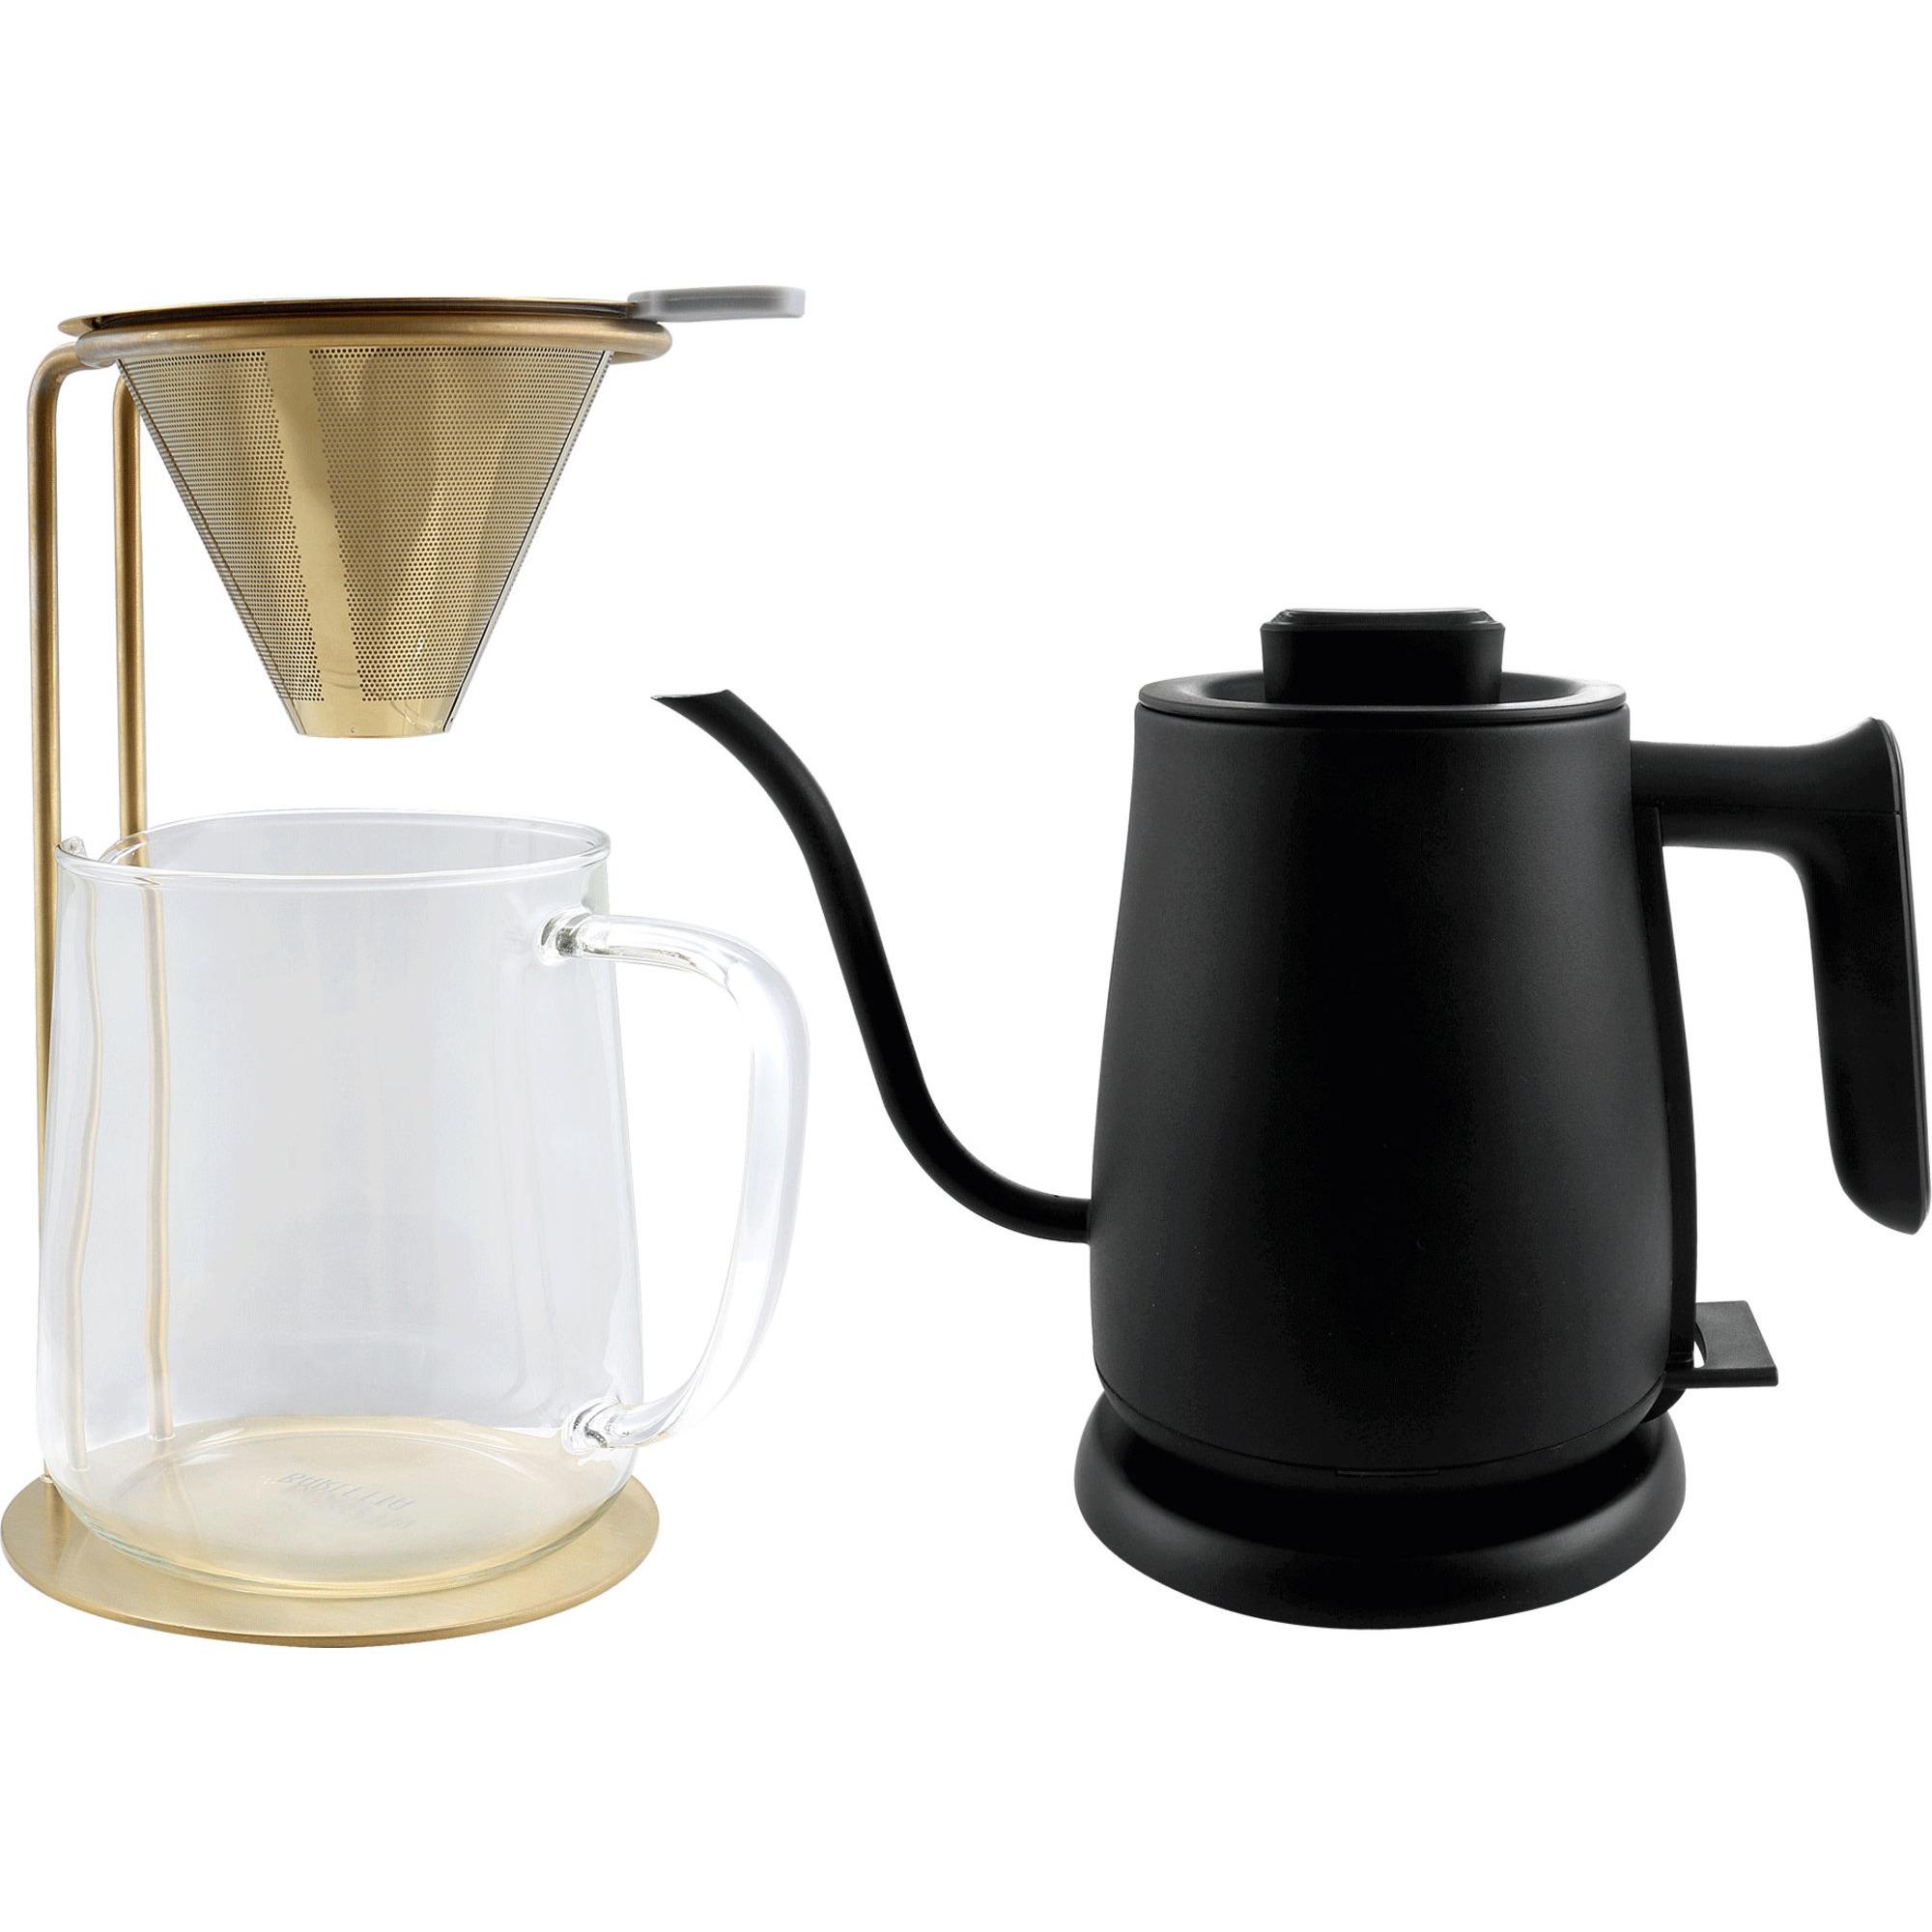 Barletta Vattenkokare + Pour Over Glaskanna med stativ